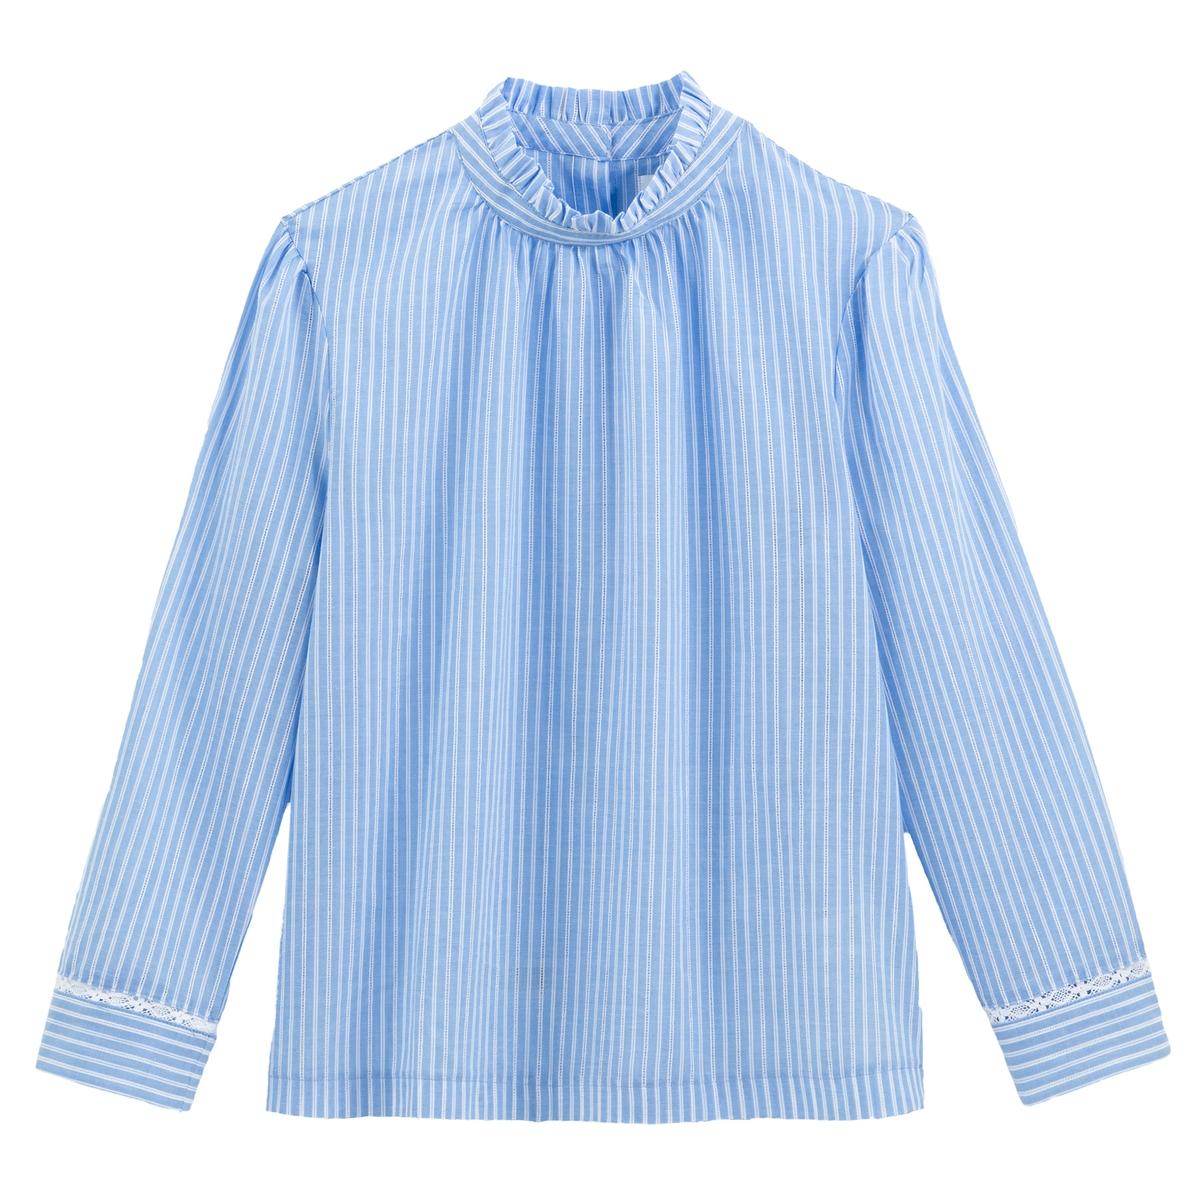 Blusa a rayas con cuello alto y manga larga